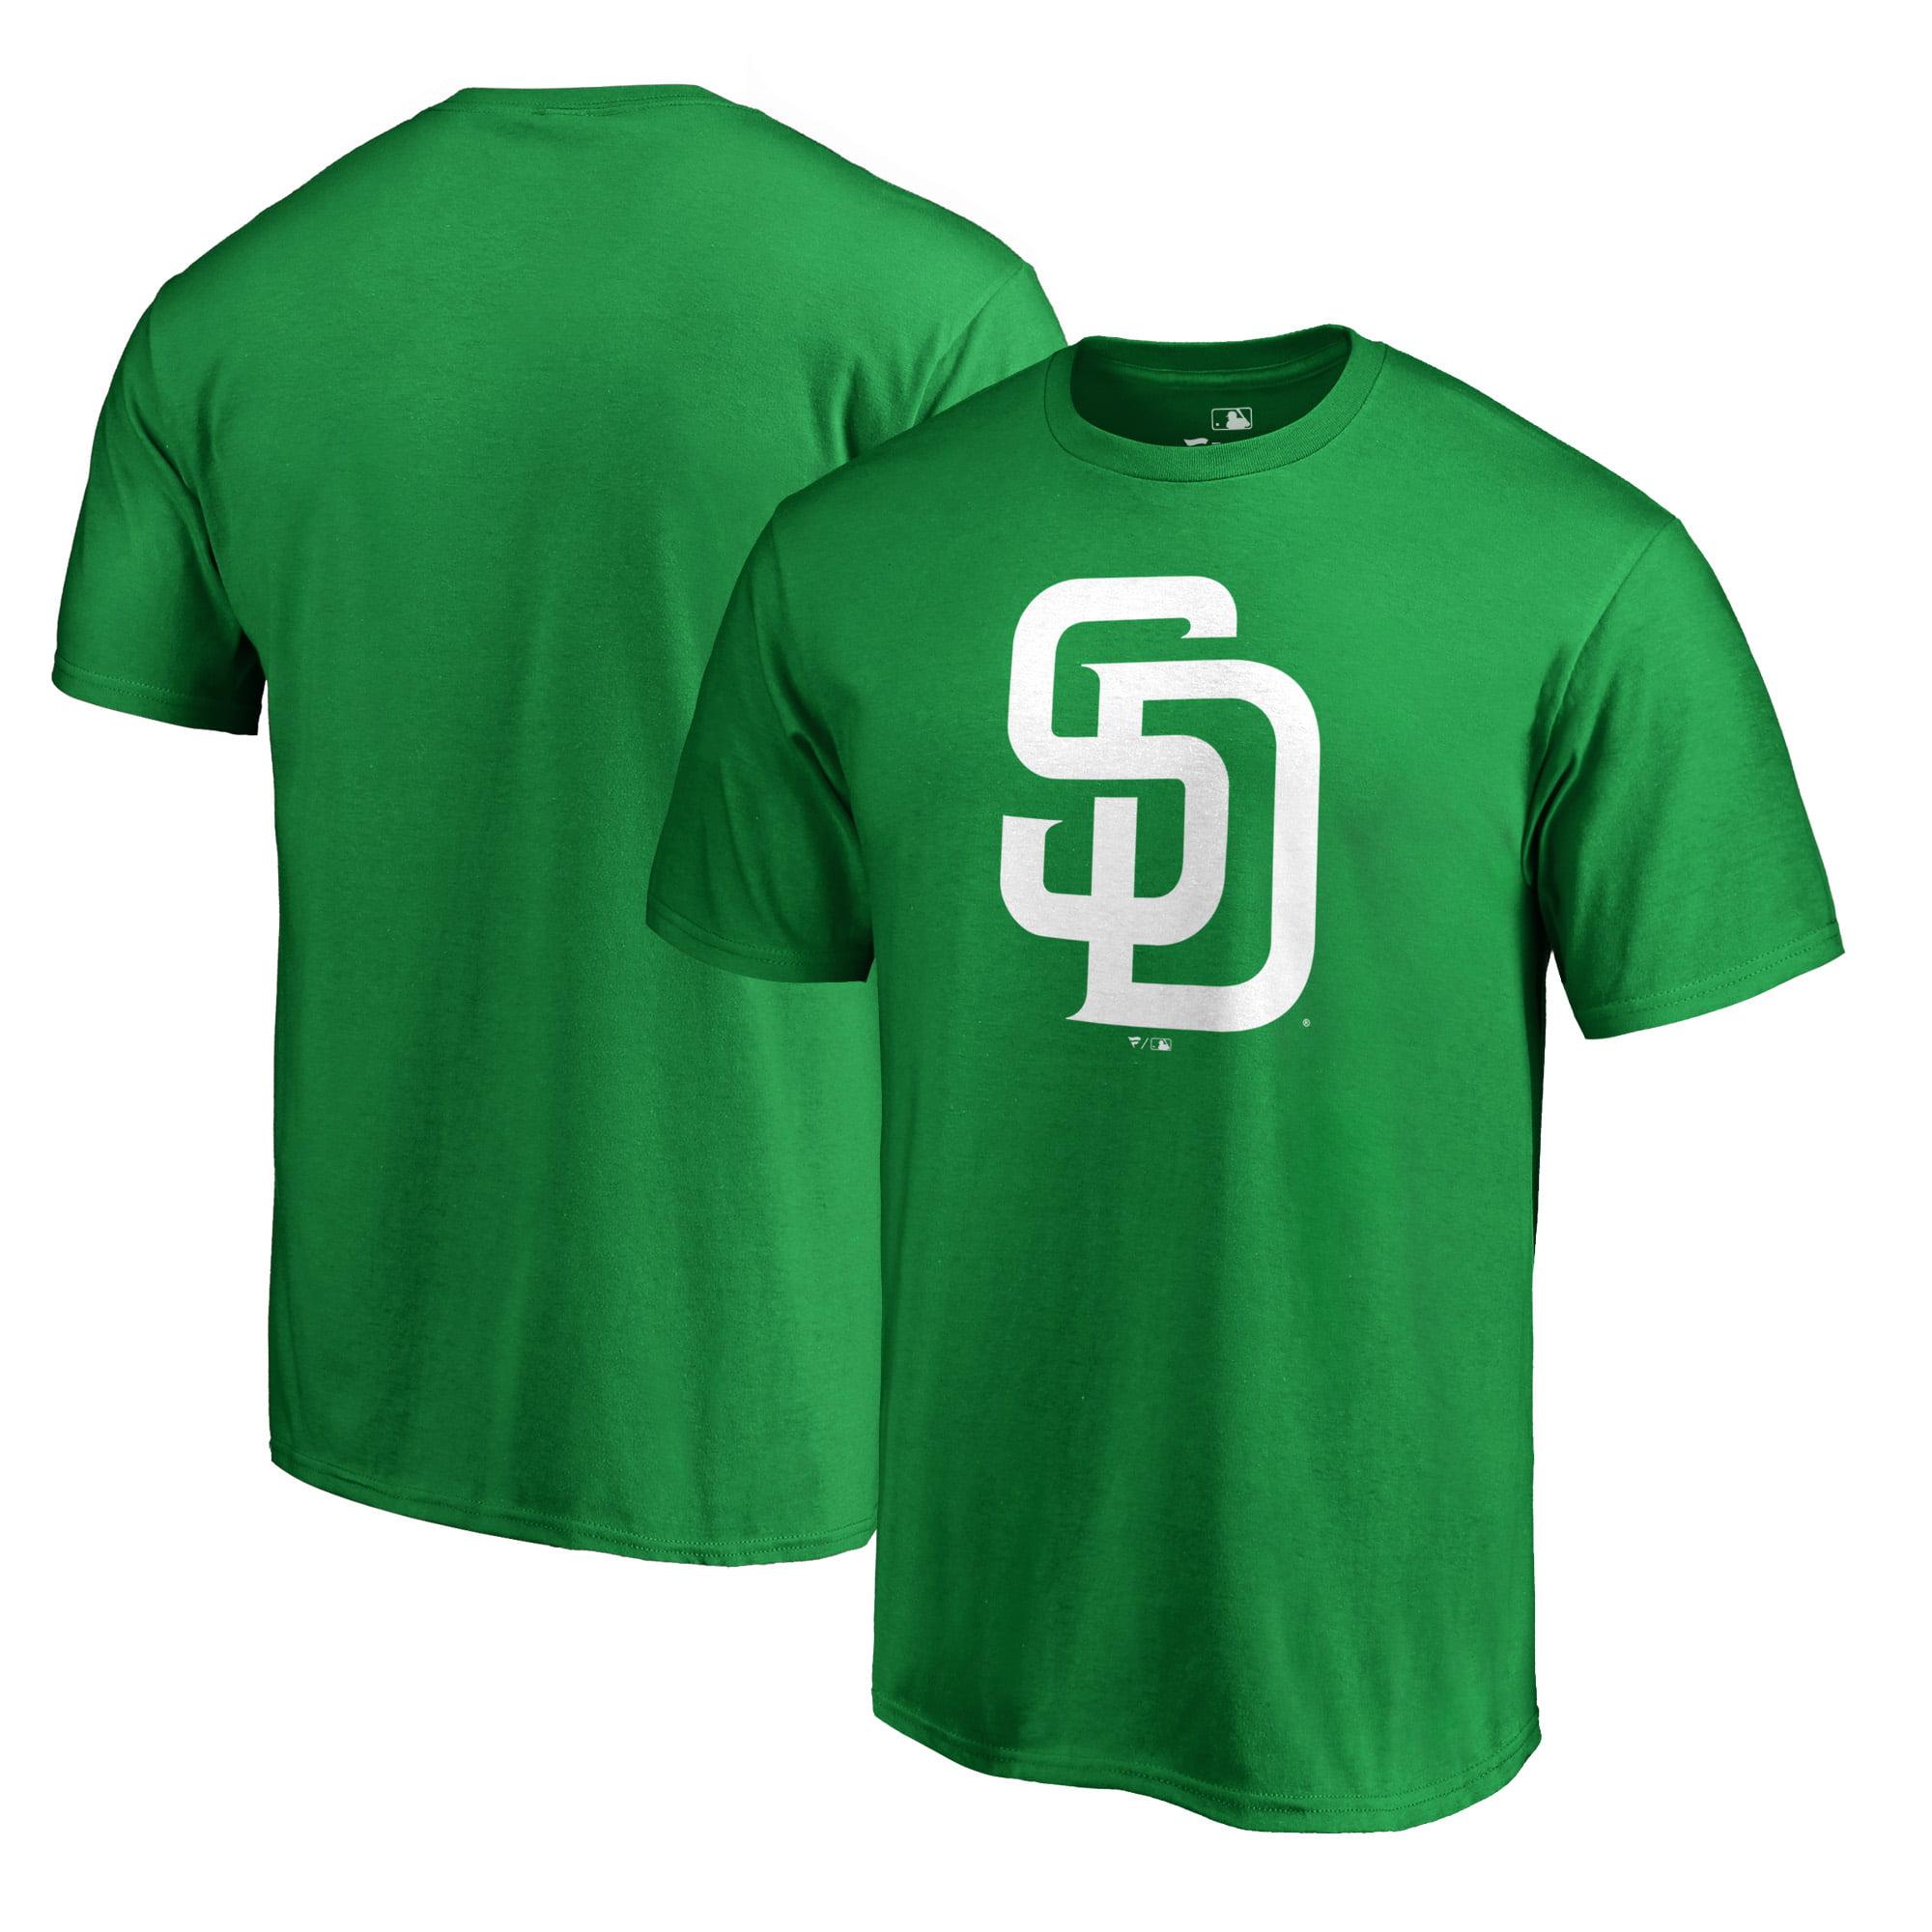 San Diego Padres Fanatics Branded St. Patrick's Day White Logo Big & Tall T-Shirt - Green